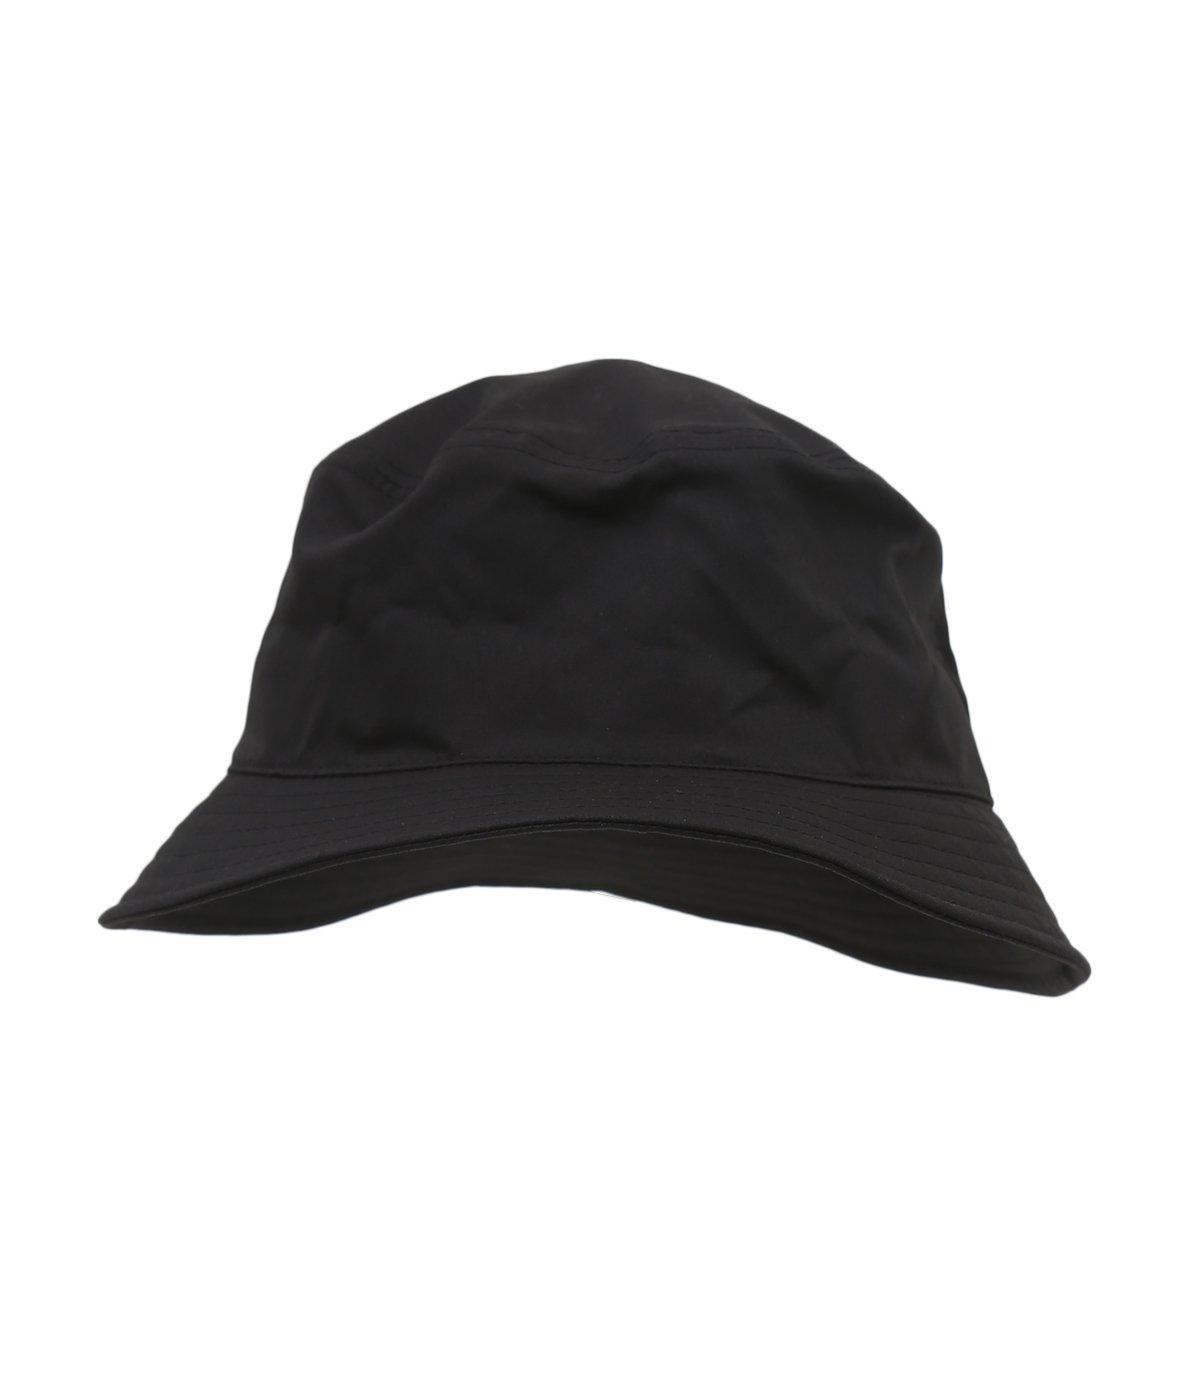 TECH MIL CHINO HAT